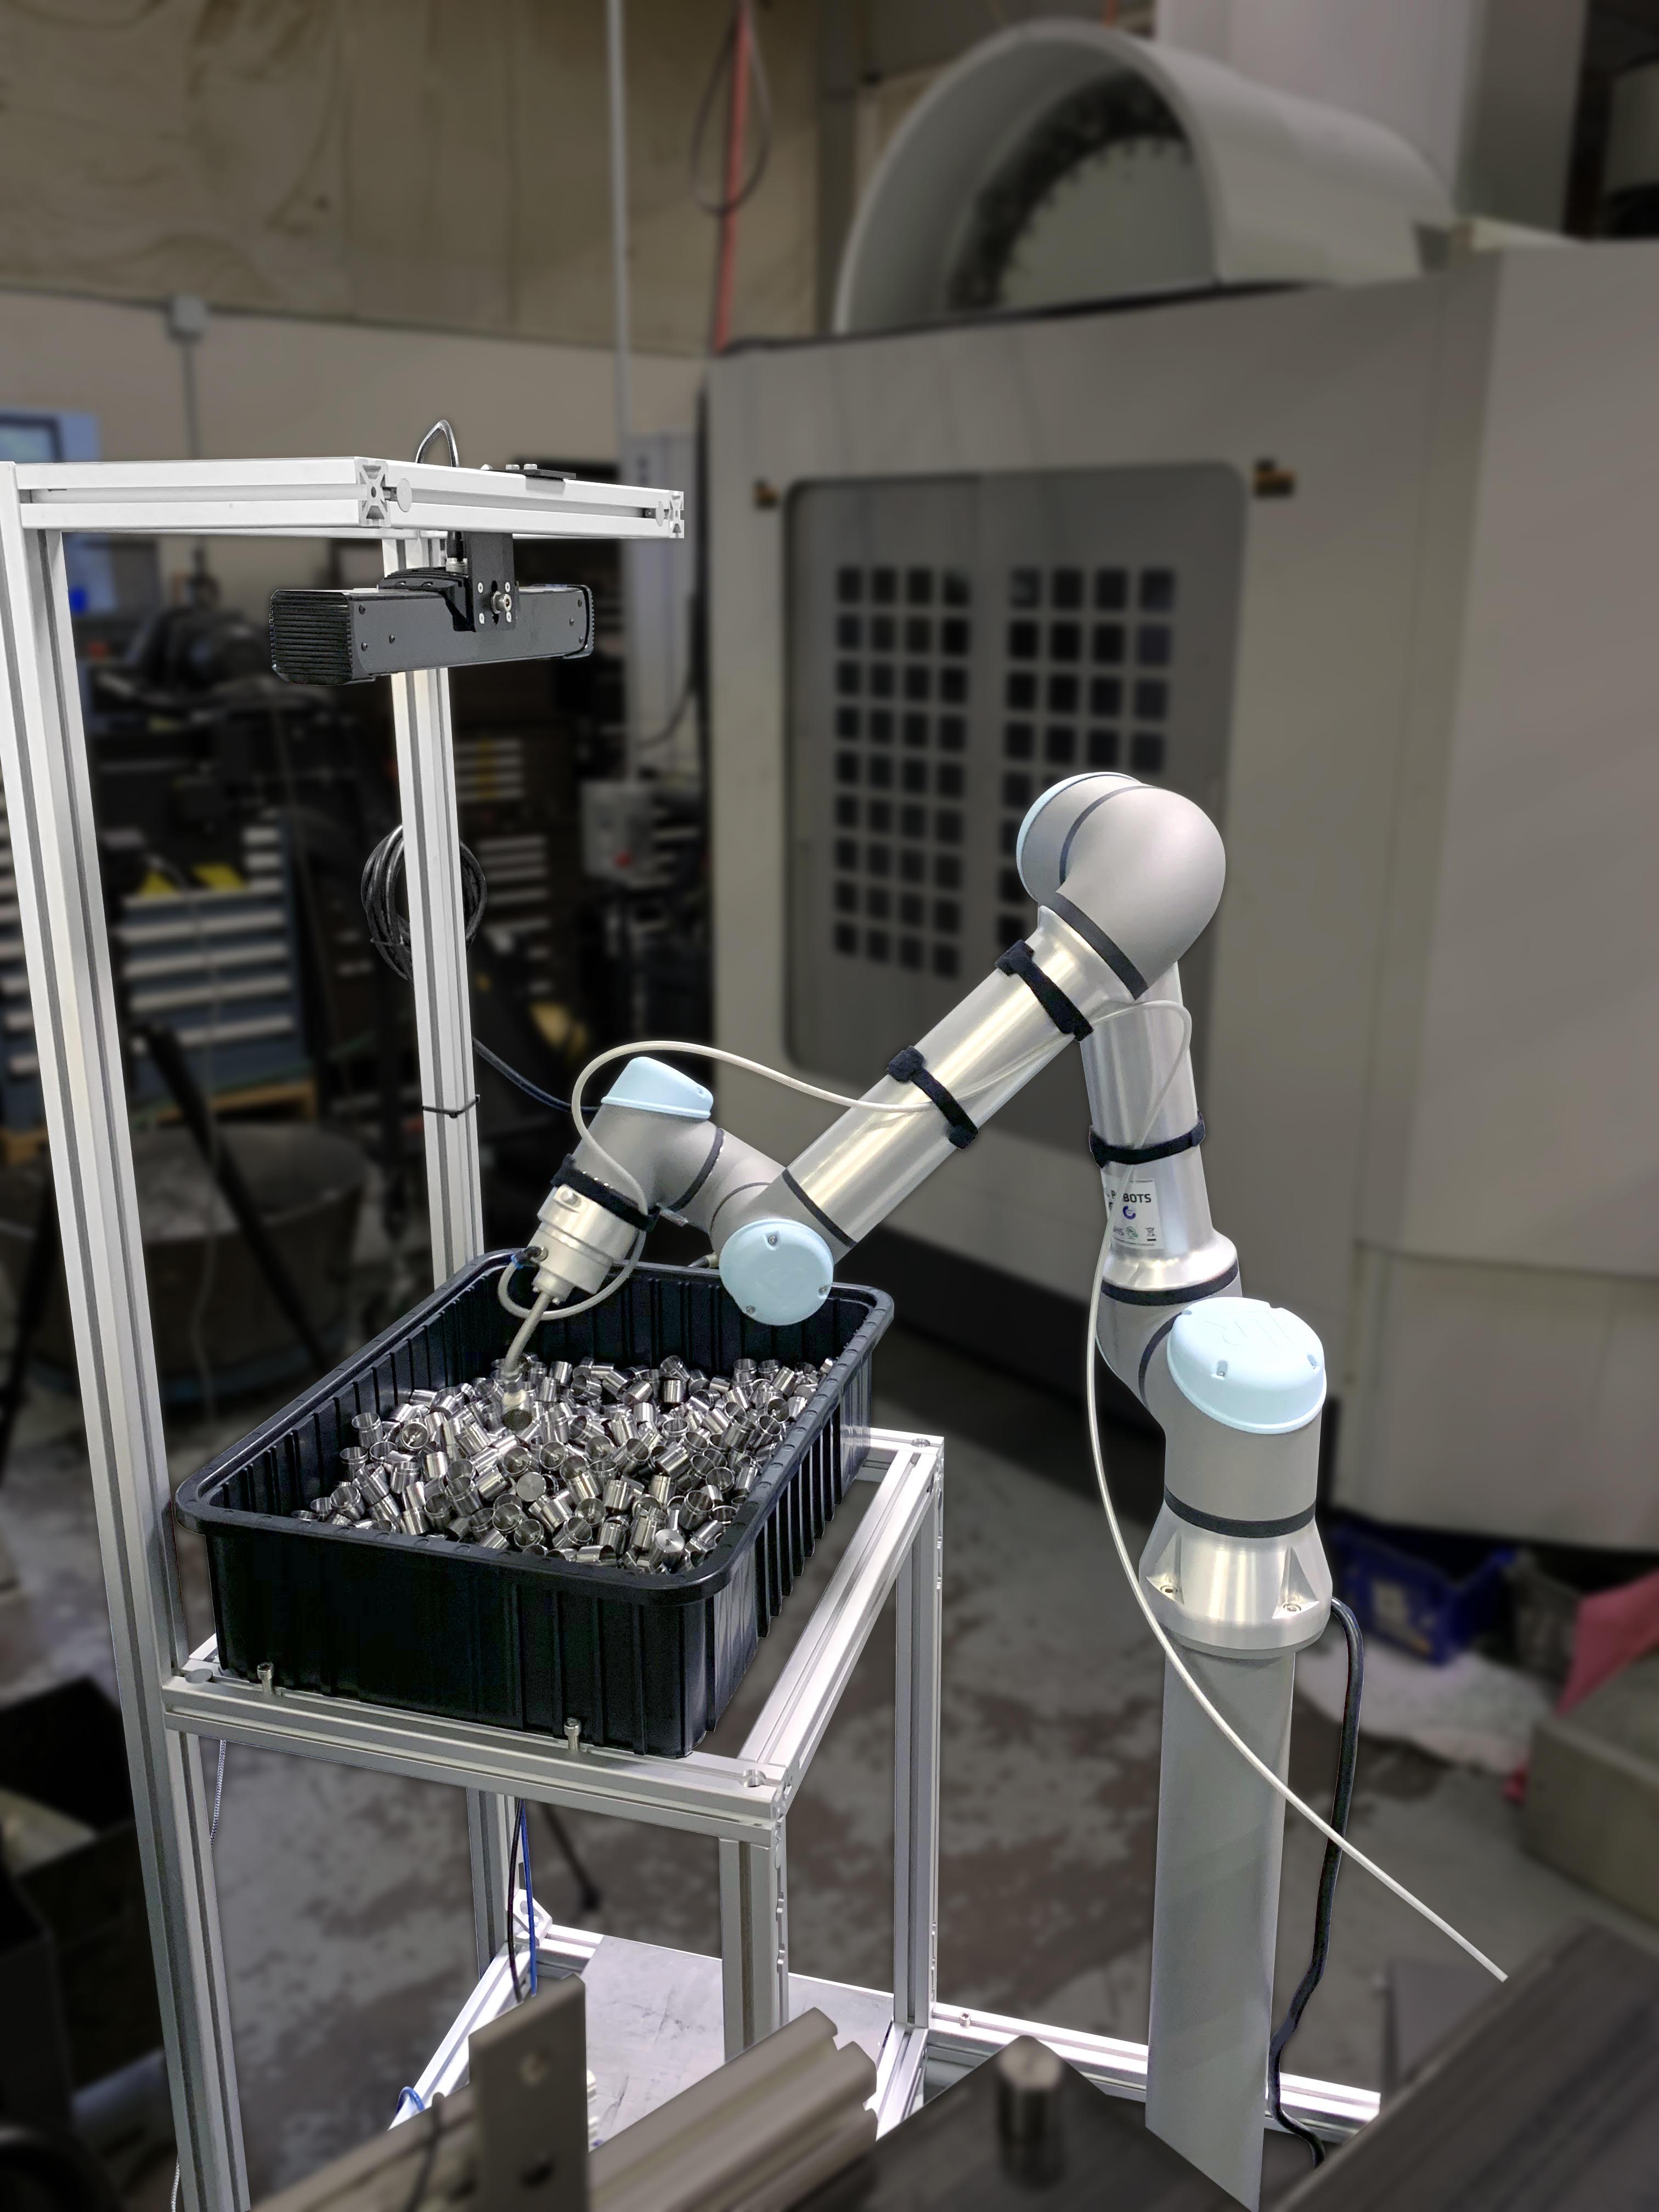 ActiNav robot makes random bin picking accessible to small facilities